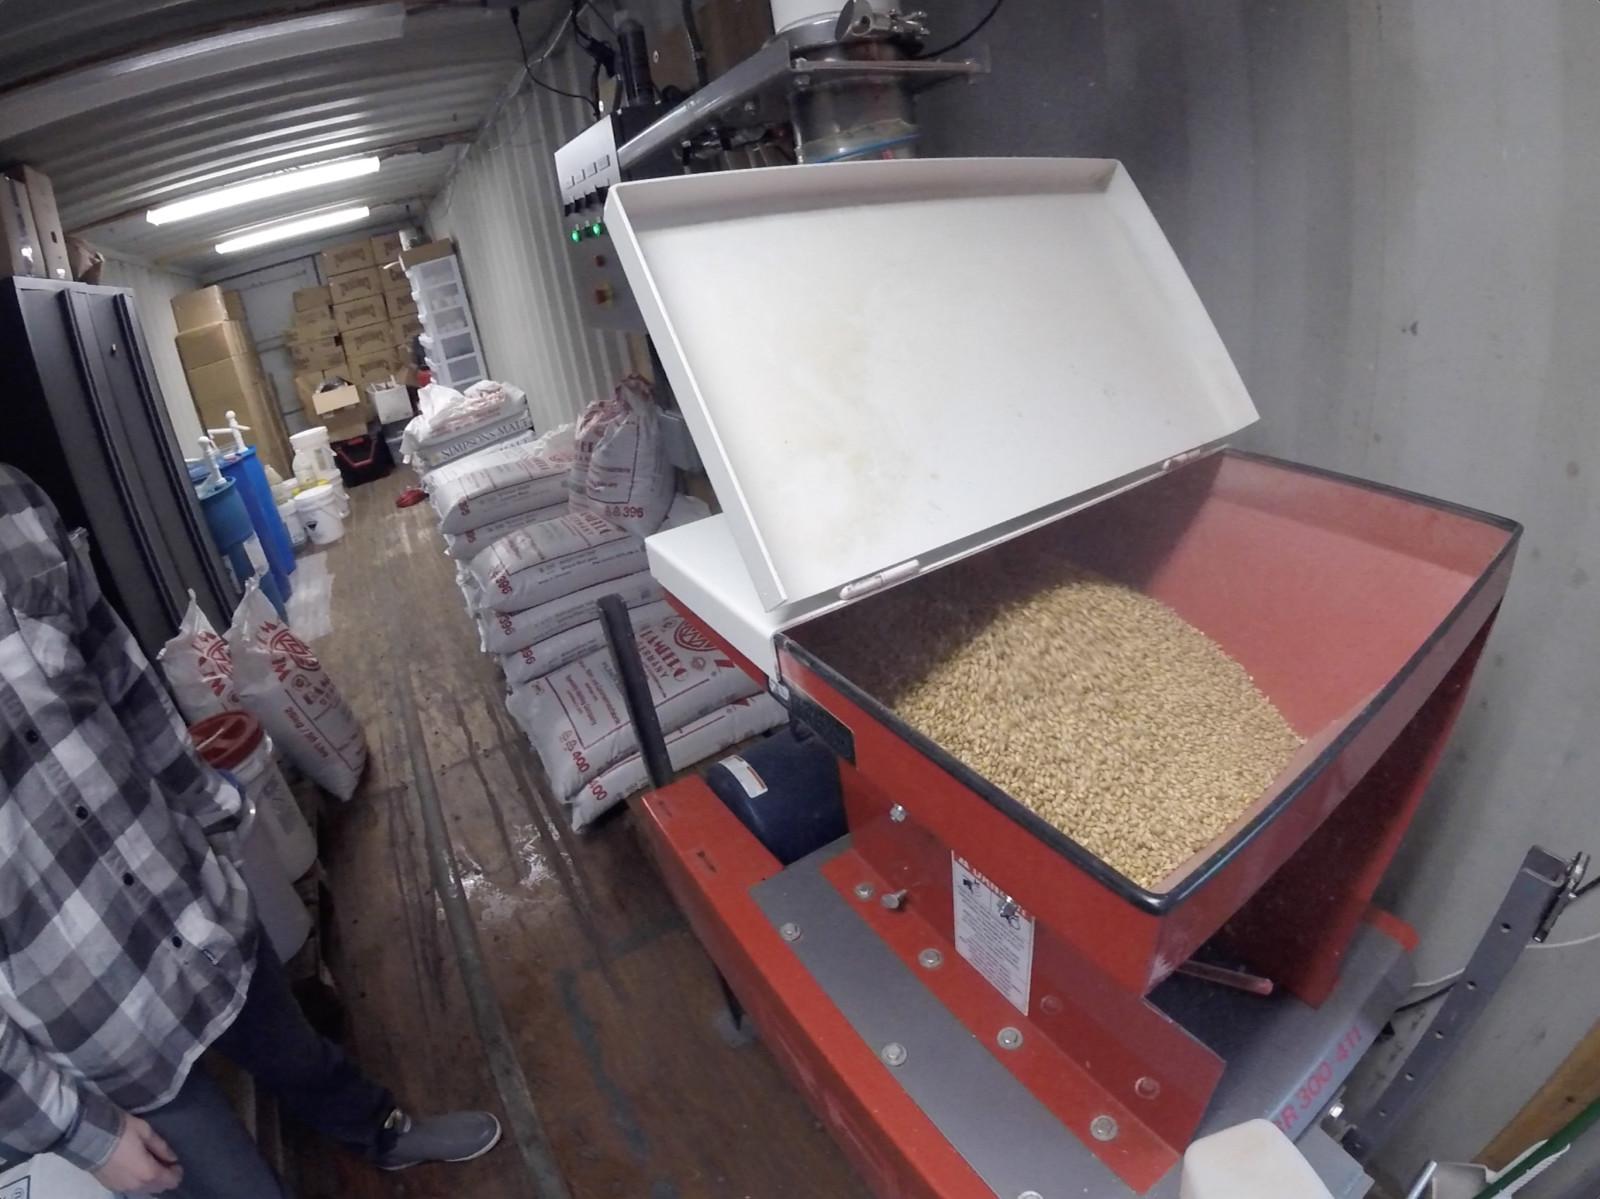 Beginner's Guide To Grain Handling | Craft Beer & Brewing